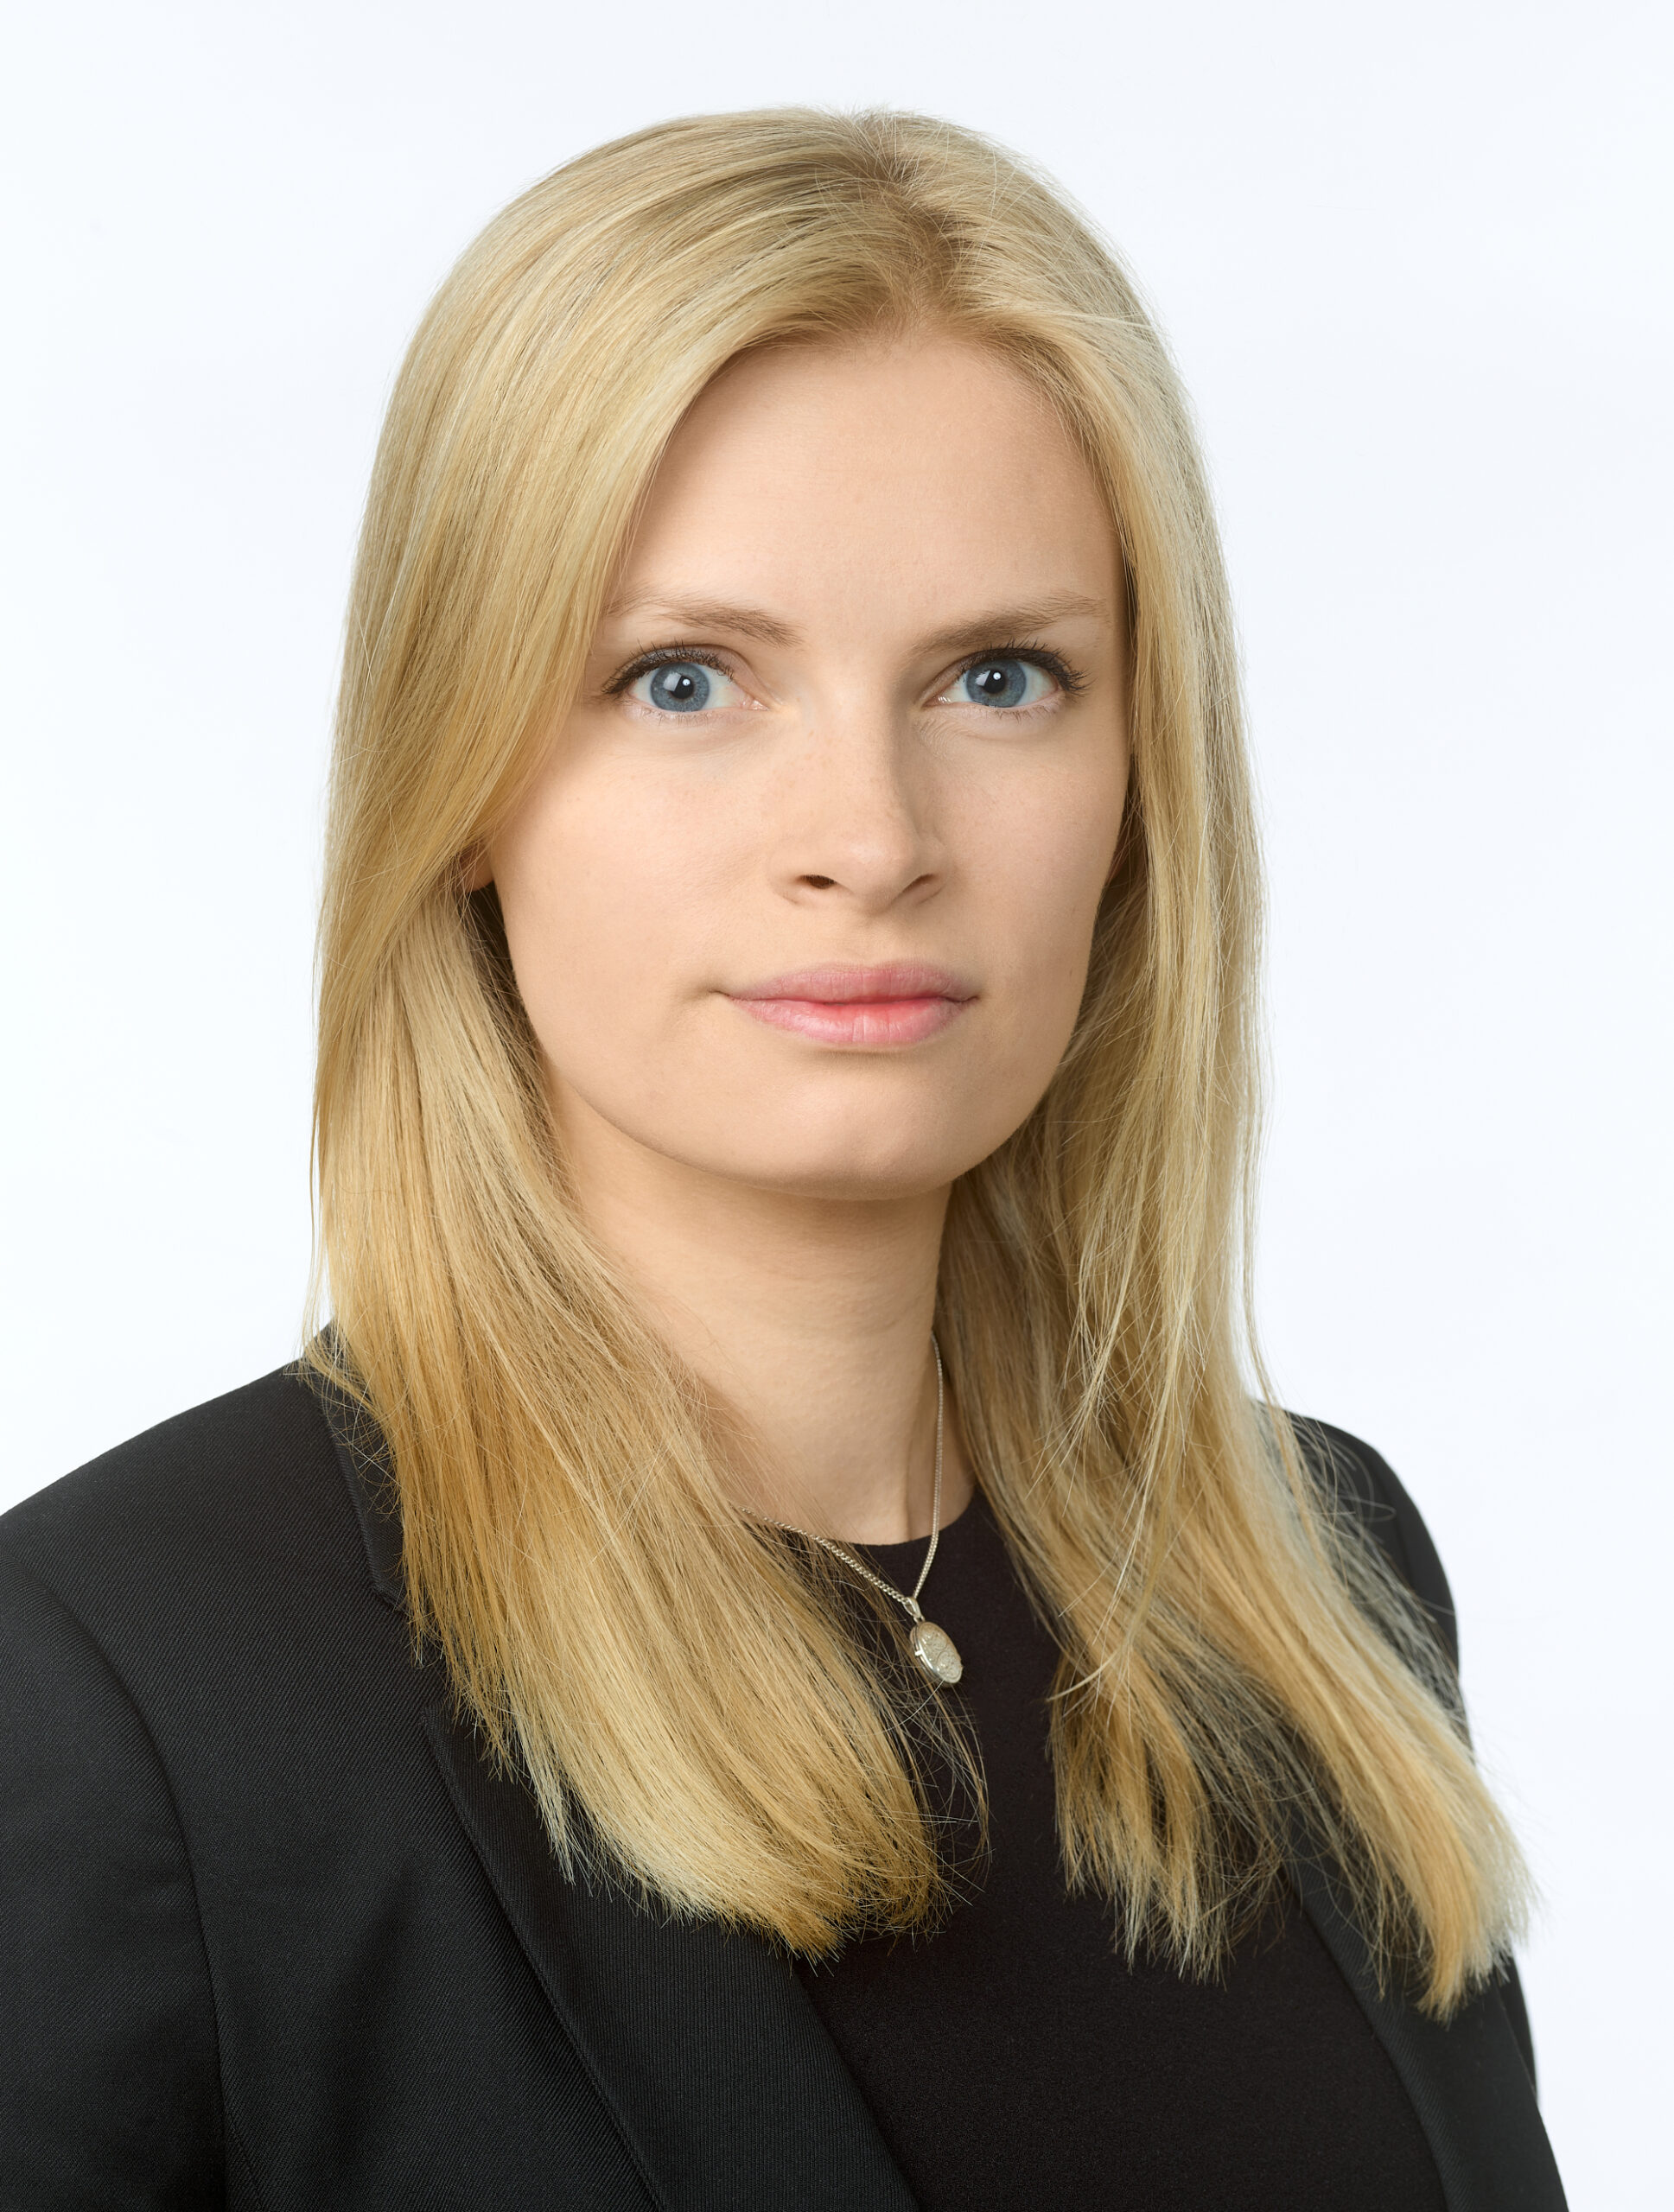 Clara Danelid